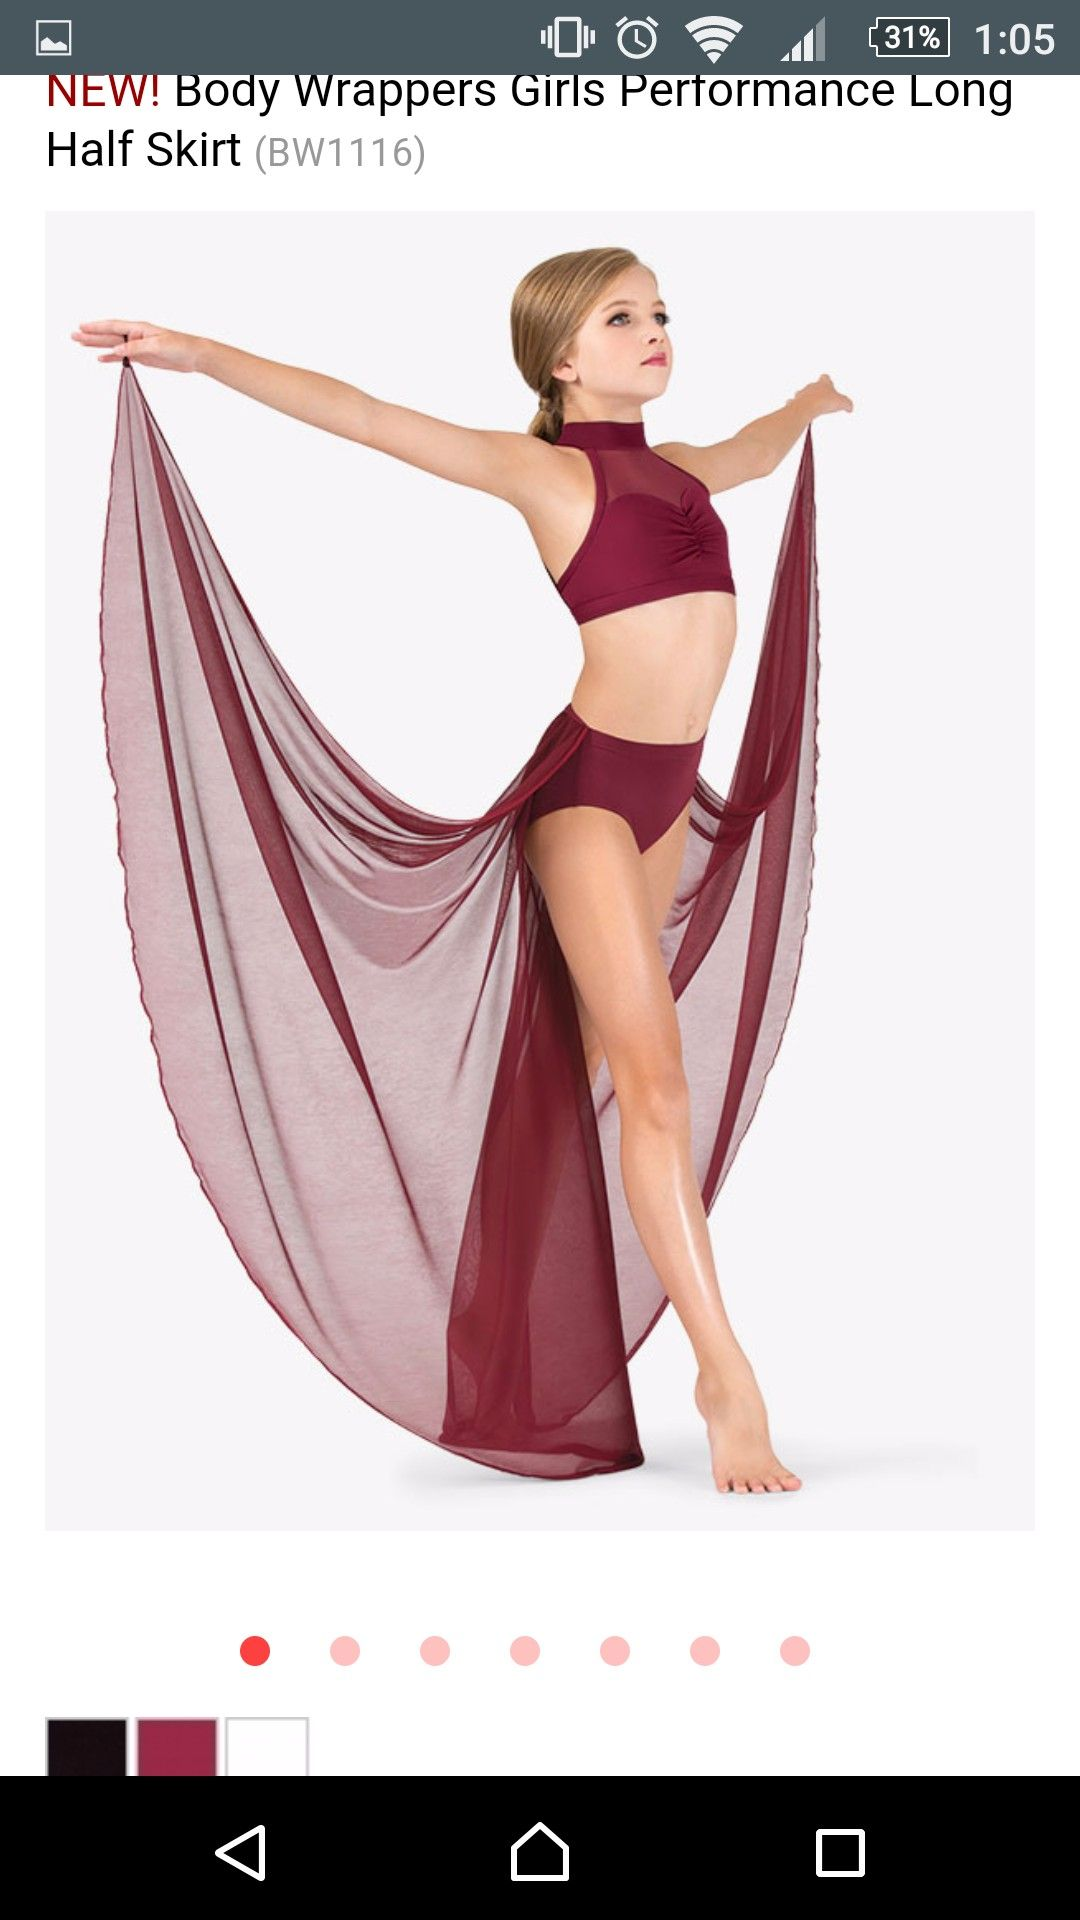 inhzoy Maillot de Danza Cl/ásica para Ni/ña El/ástico Leotardo de Ballet Patinaje Art/ístico Correas Cruzadas Body Gimnasia R/ítmica Traje de Bailarina